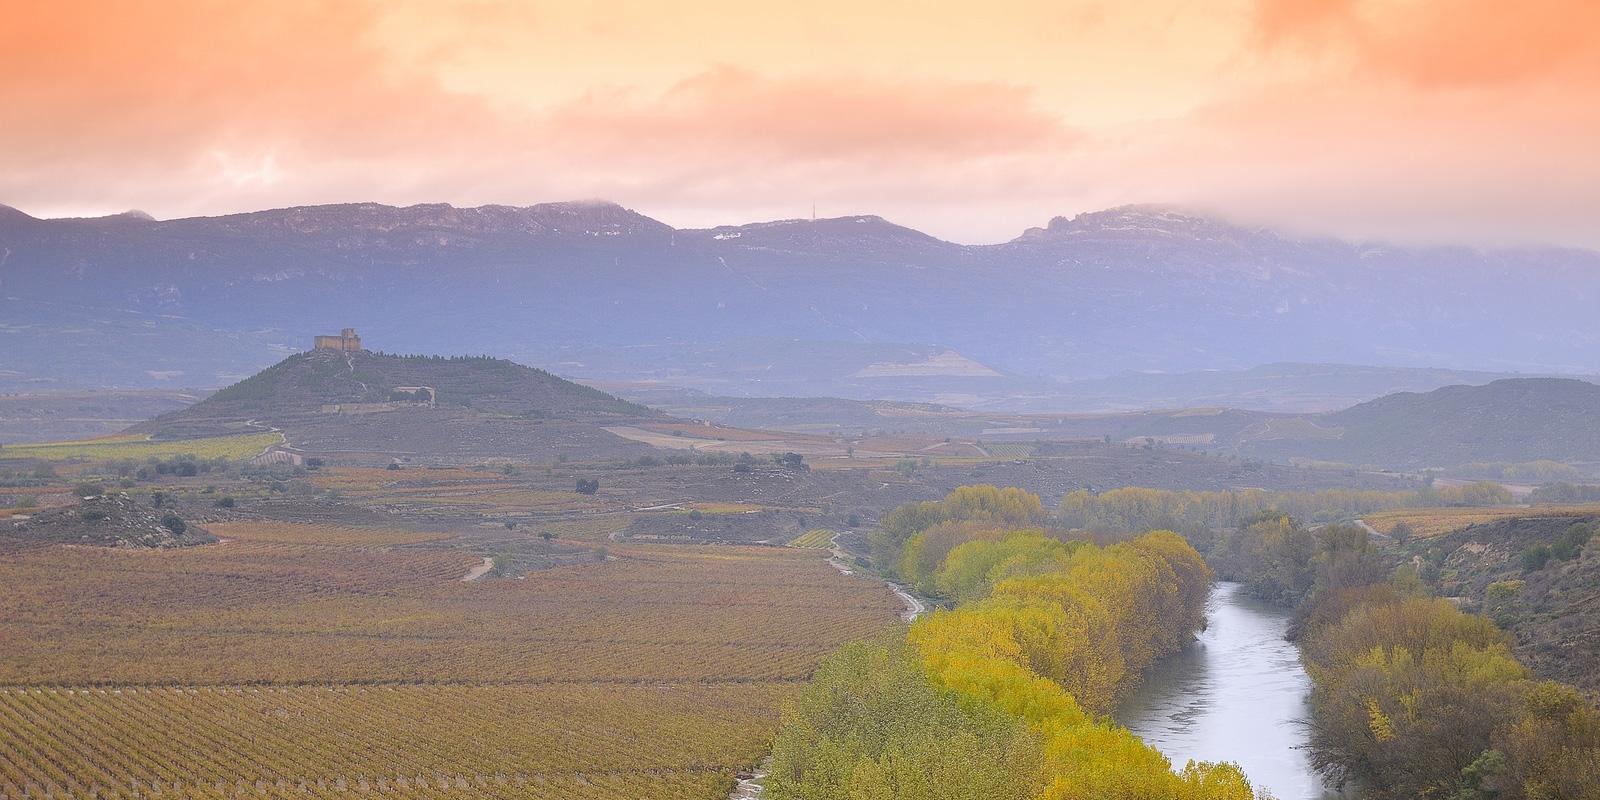 Vineyards in the province of La Rioja in Spain, Essential Winemakers